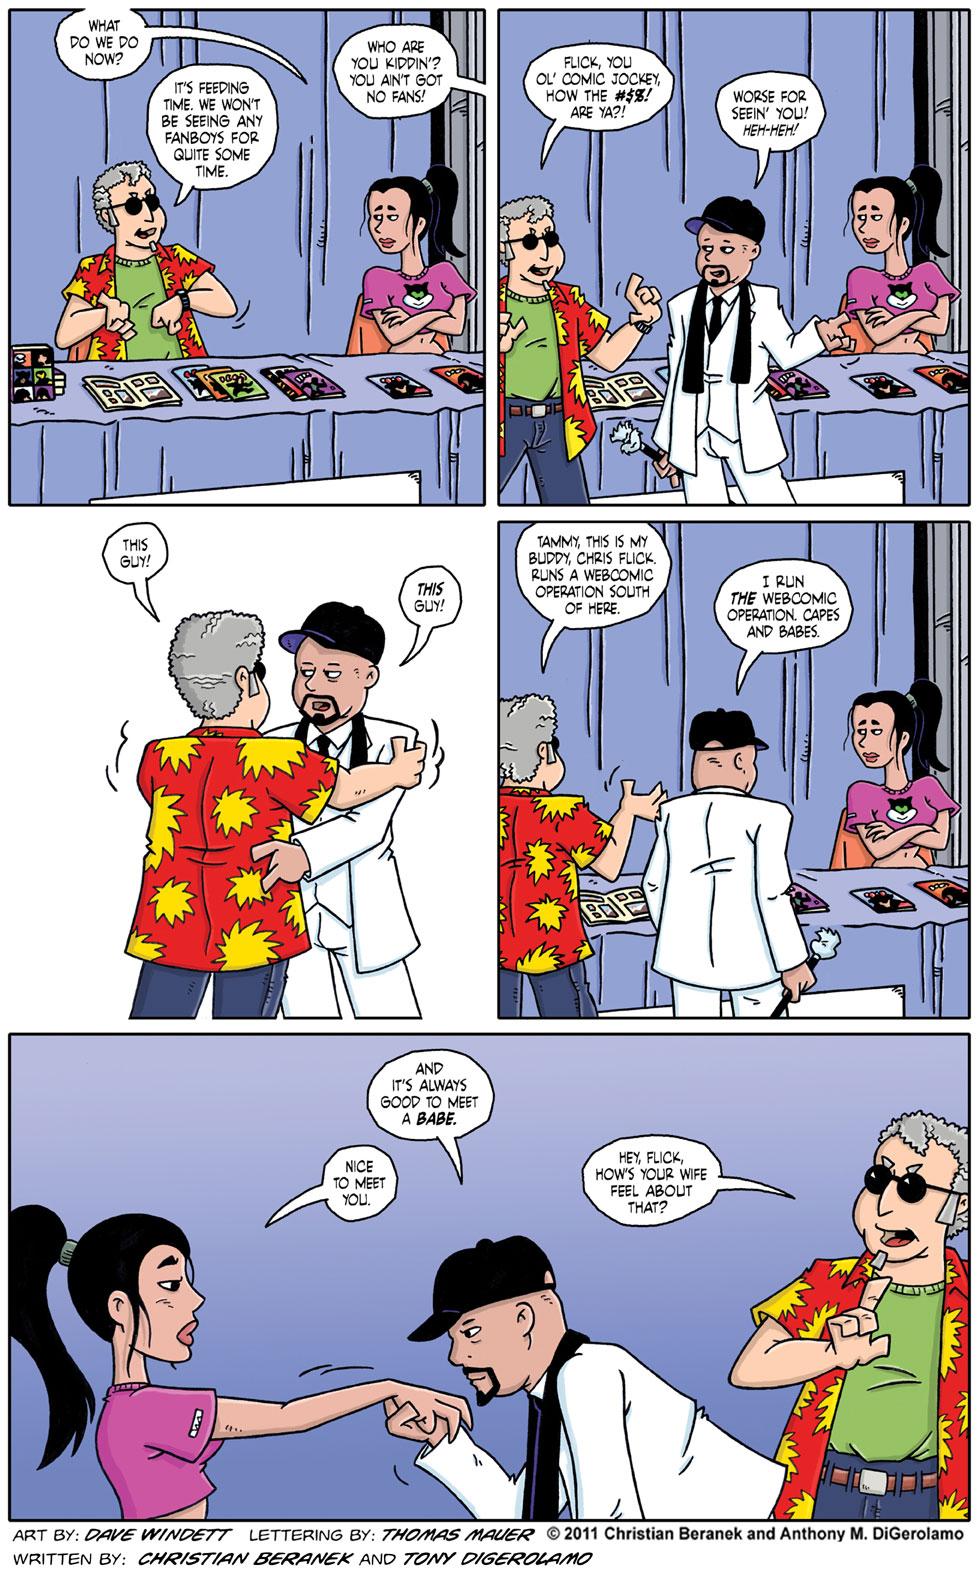 Comic Book Mafia #56:  Chris Flick